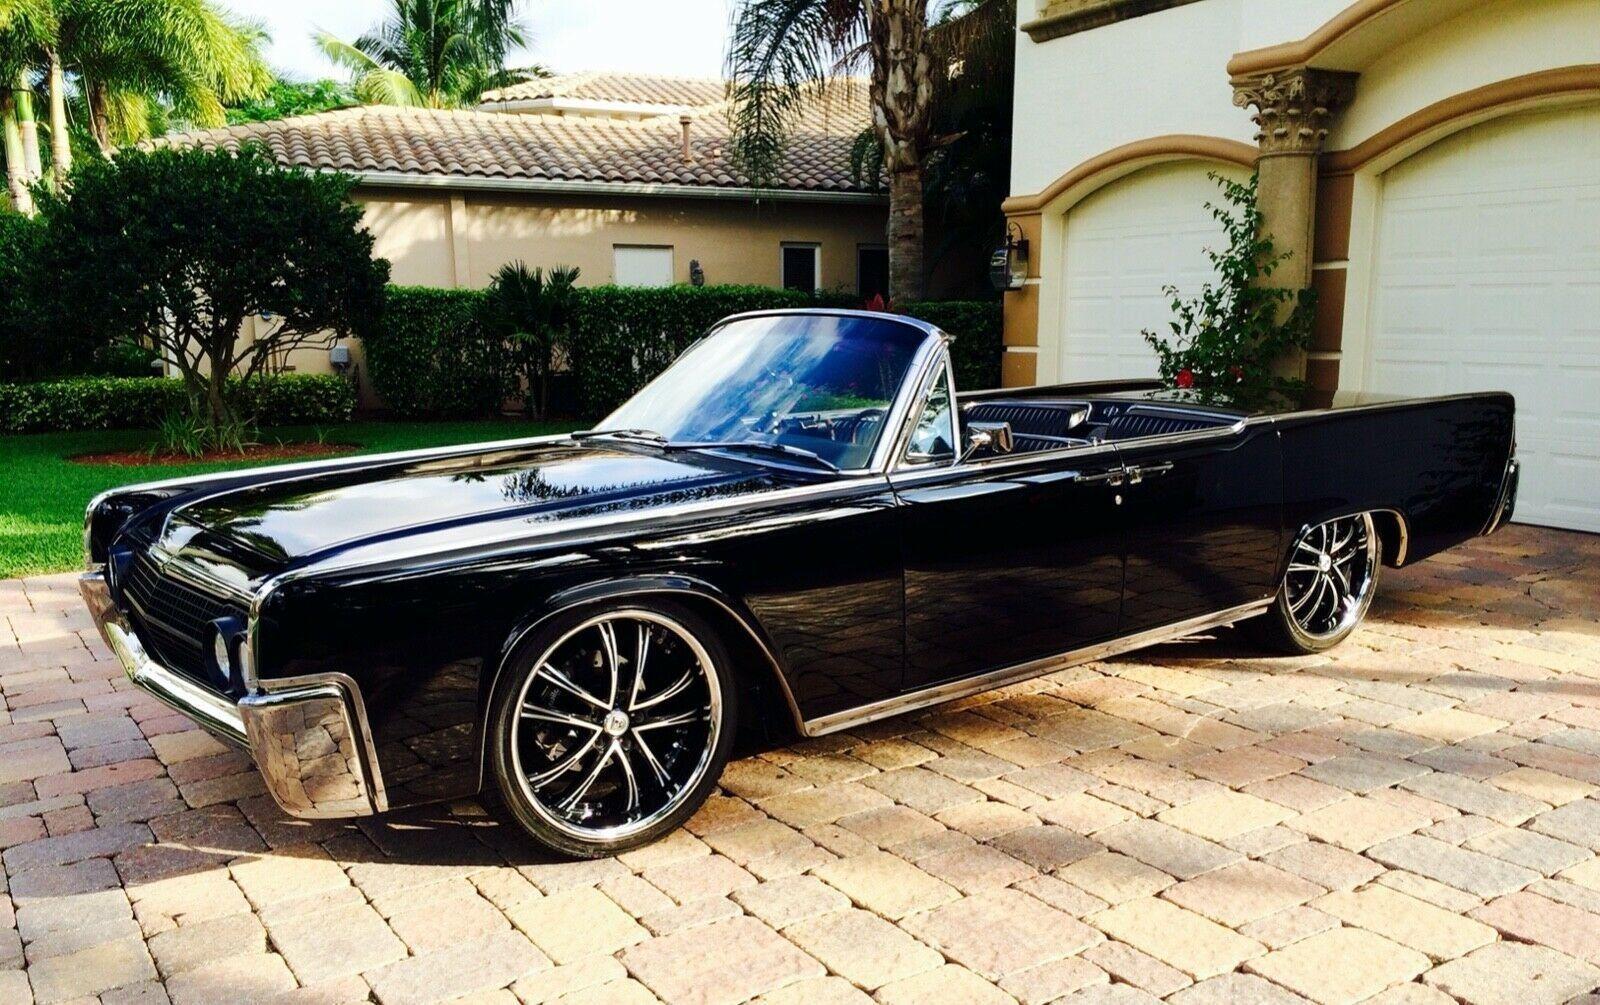 "<img src=""1963-lincoln-continental-convertible.jpeg"" alt=""A 1963 Lincoln Continental convertible"">"